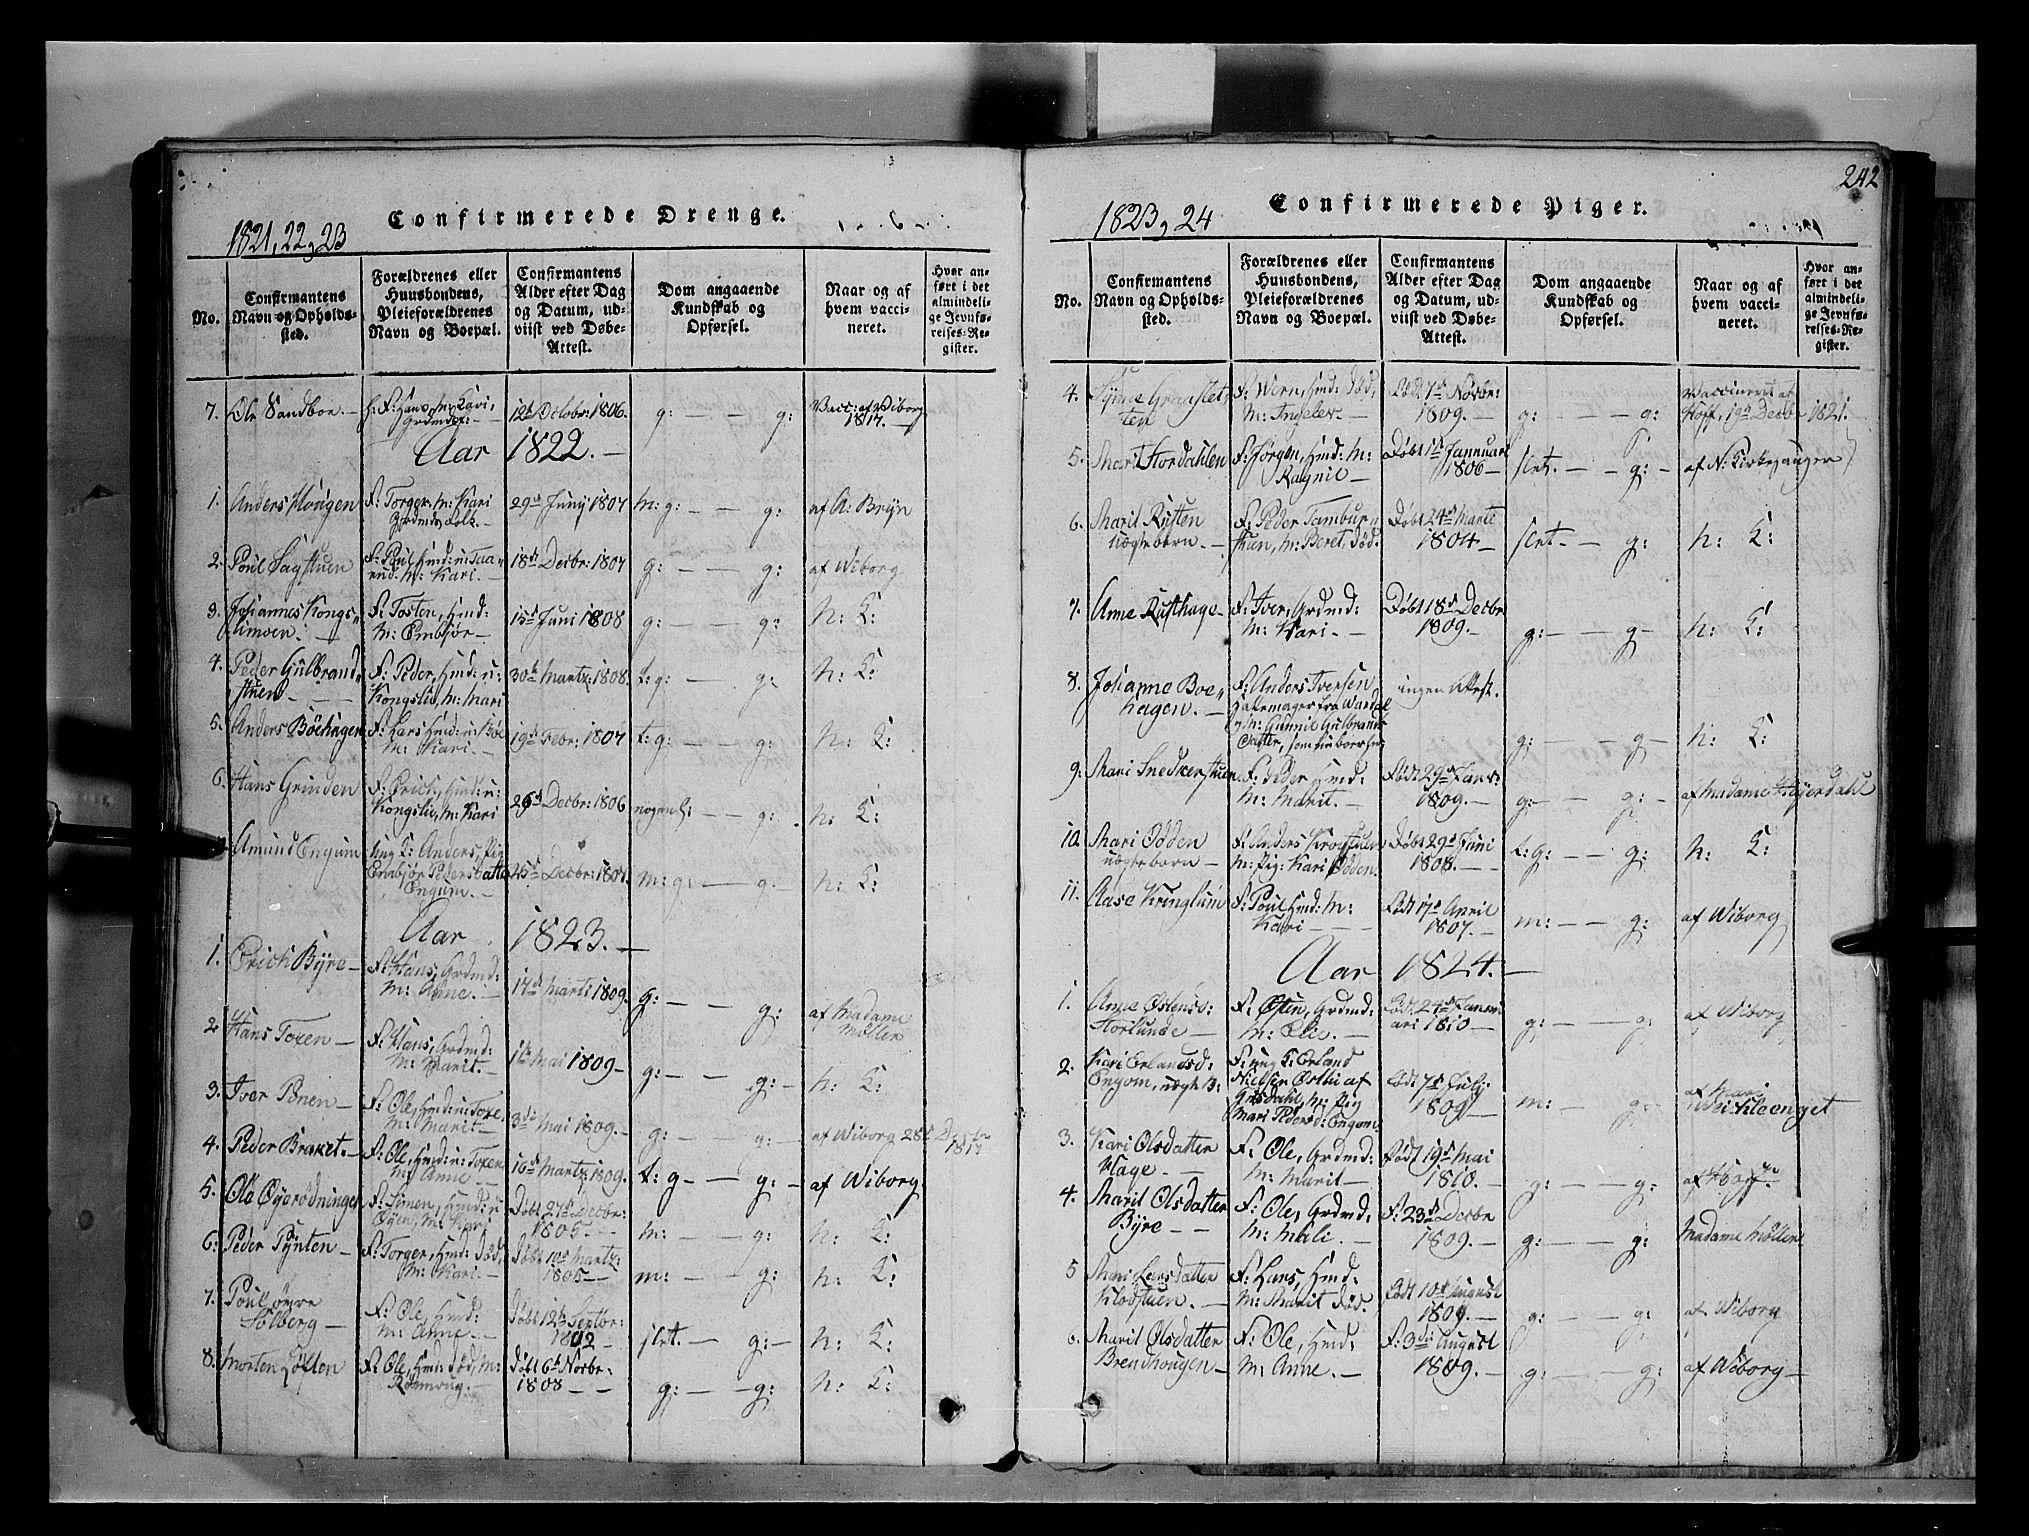 SAH, Fron prestekontor, H/Ha/Hab/L0004: Klokkerbok nr. 4, 1816-1850, s. 242